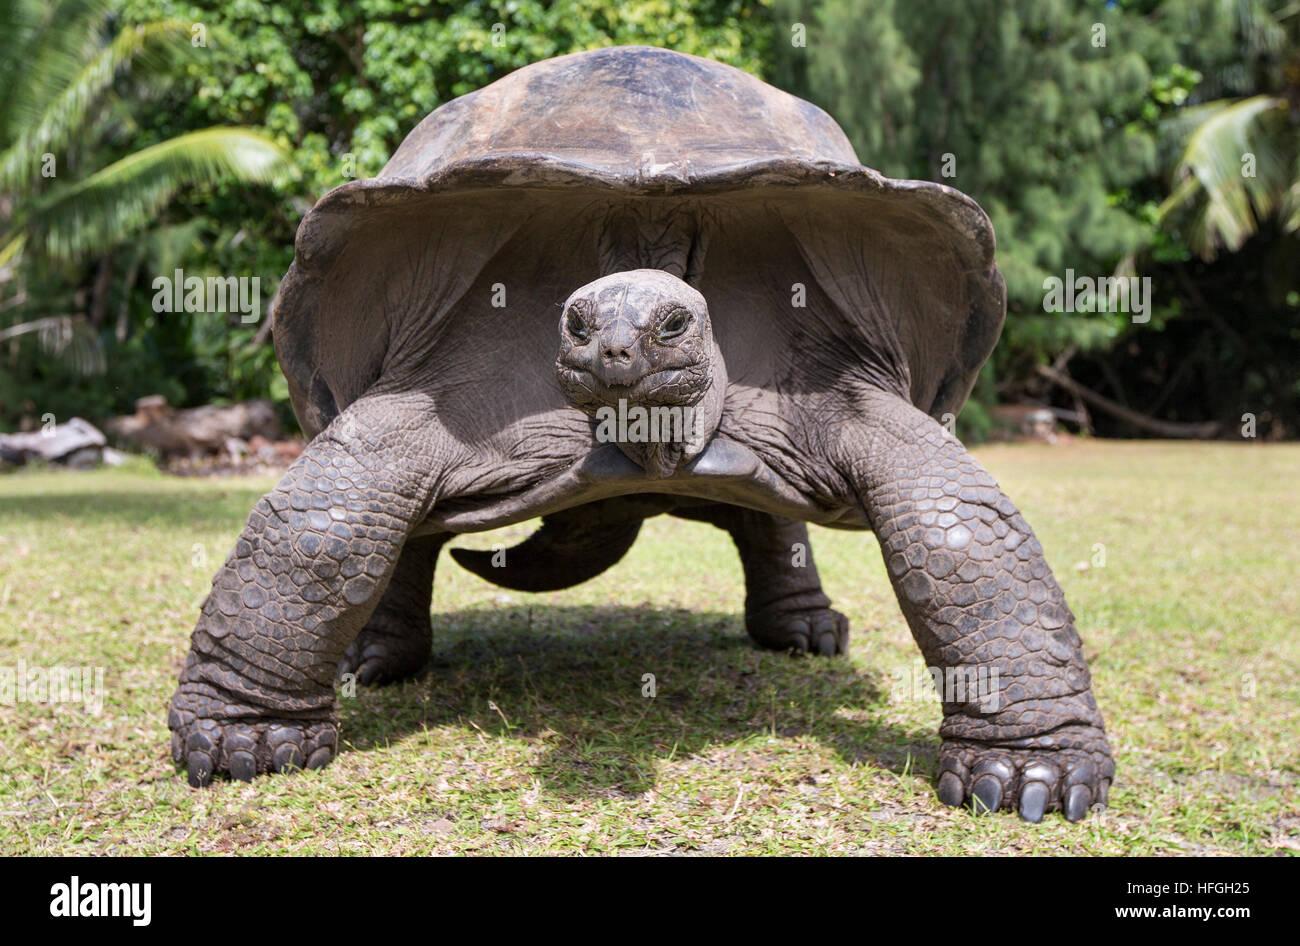 Aldabra Giant Tortoise  at tropical island in Seychelles - Stock Image